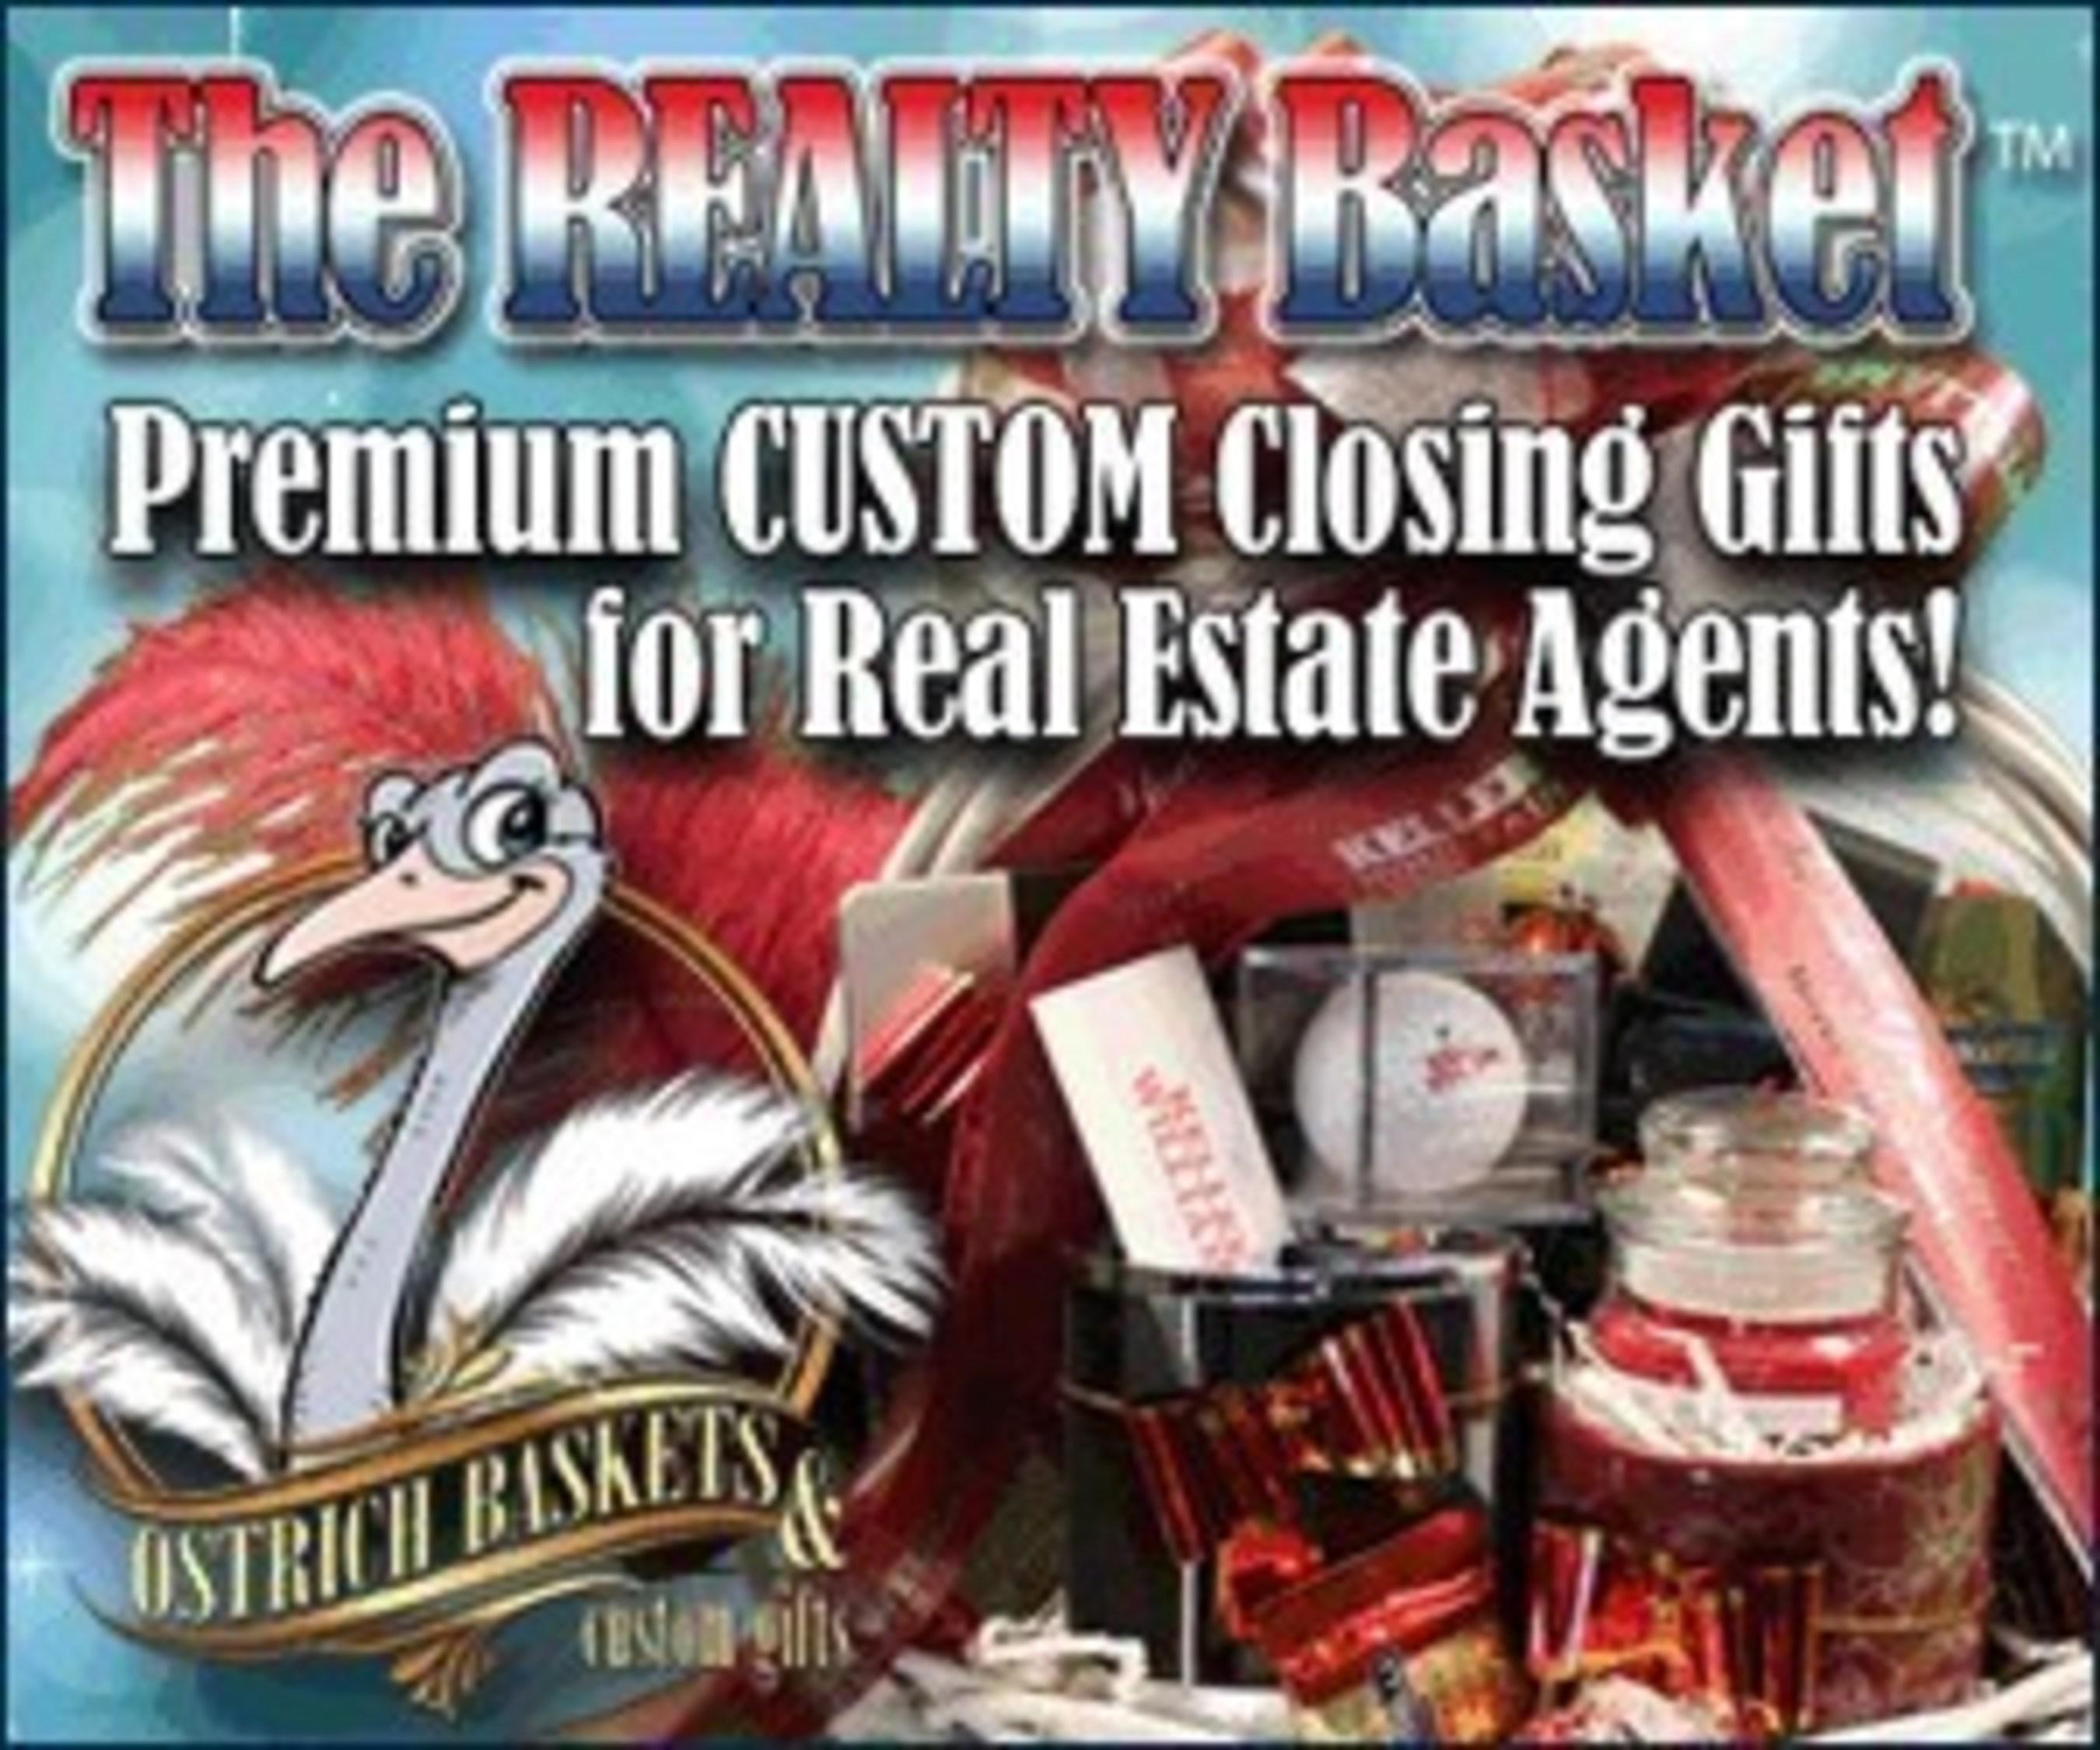 Ostrich Baskets & Custom Gifts (PRNewsFoto/Ostrich Baskets & Custom Gifts)